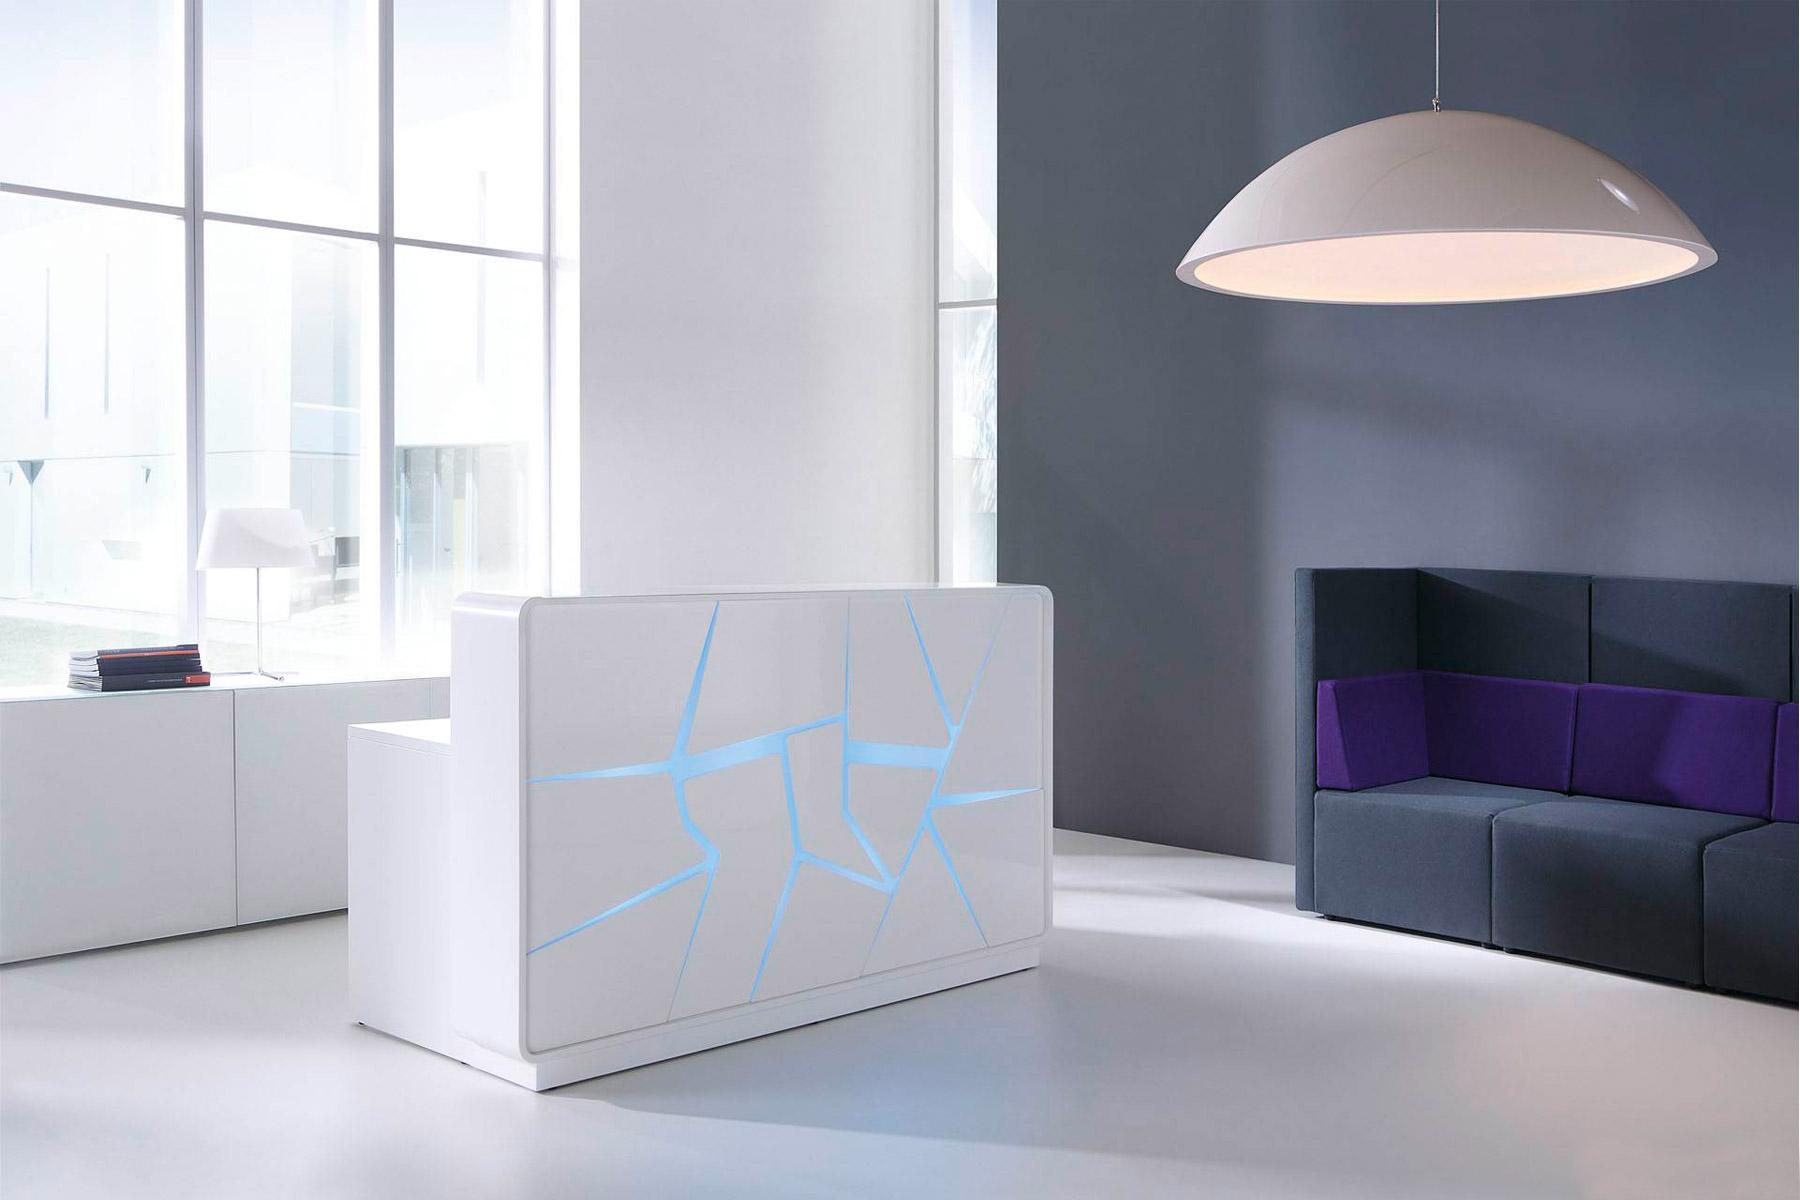 banquise banque d 39 accueil baltys. Black Bedroom Furniture Sets. Home Design Ideas